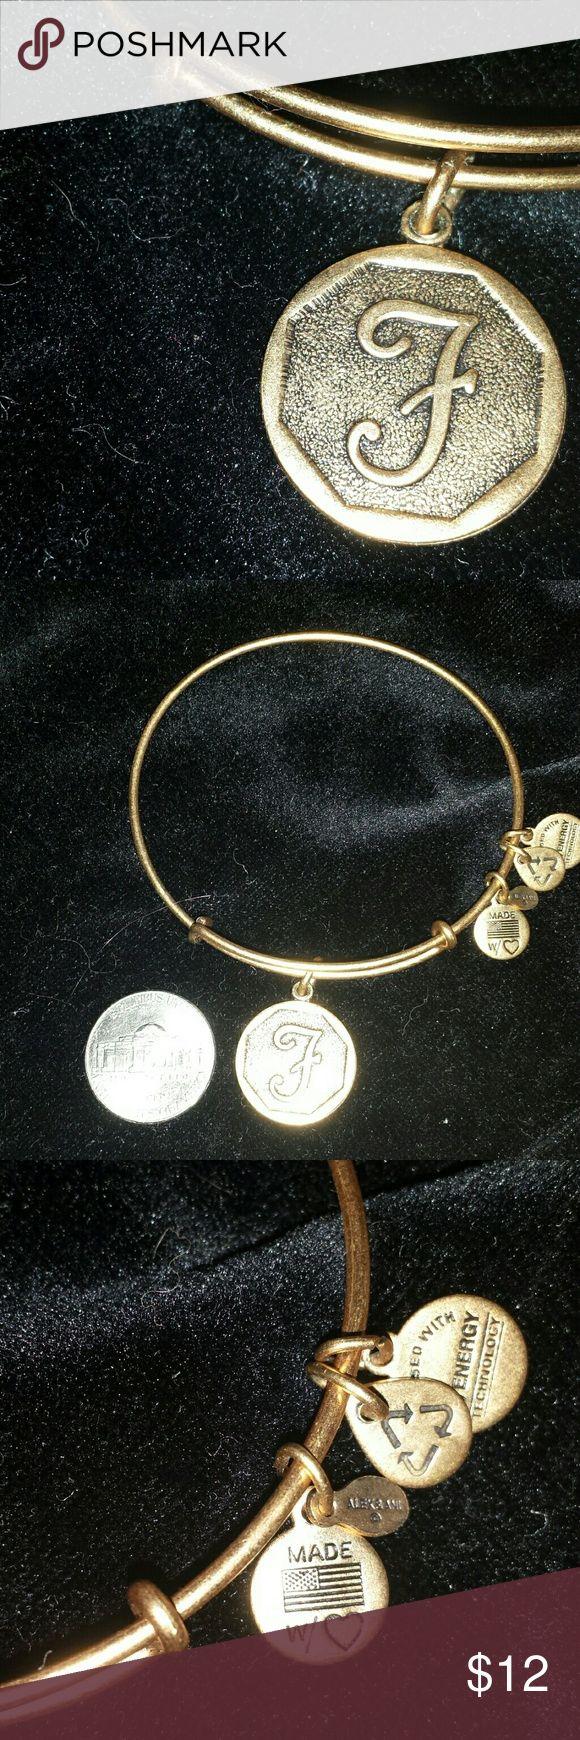 "Alex & Ani Gold Monogram Bracelet Authentic Alex & Ani gold tone ""F"" monogram bracelet. Never worn. In like new condition. No box, no paperwork. Alex & Ani Jewelry Bracelets"